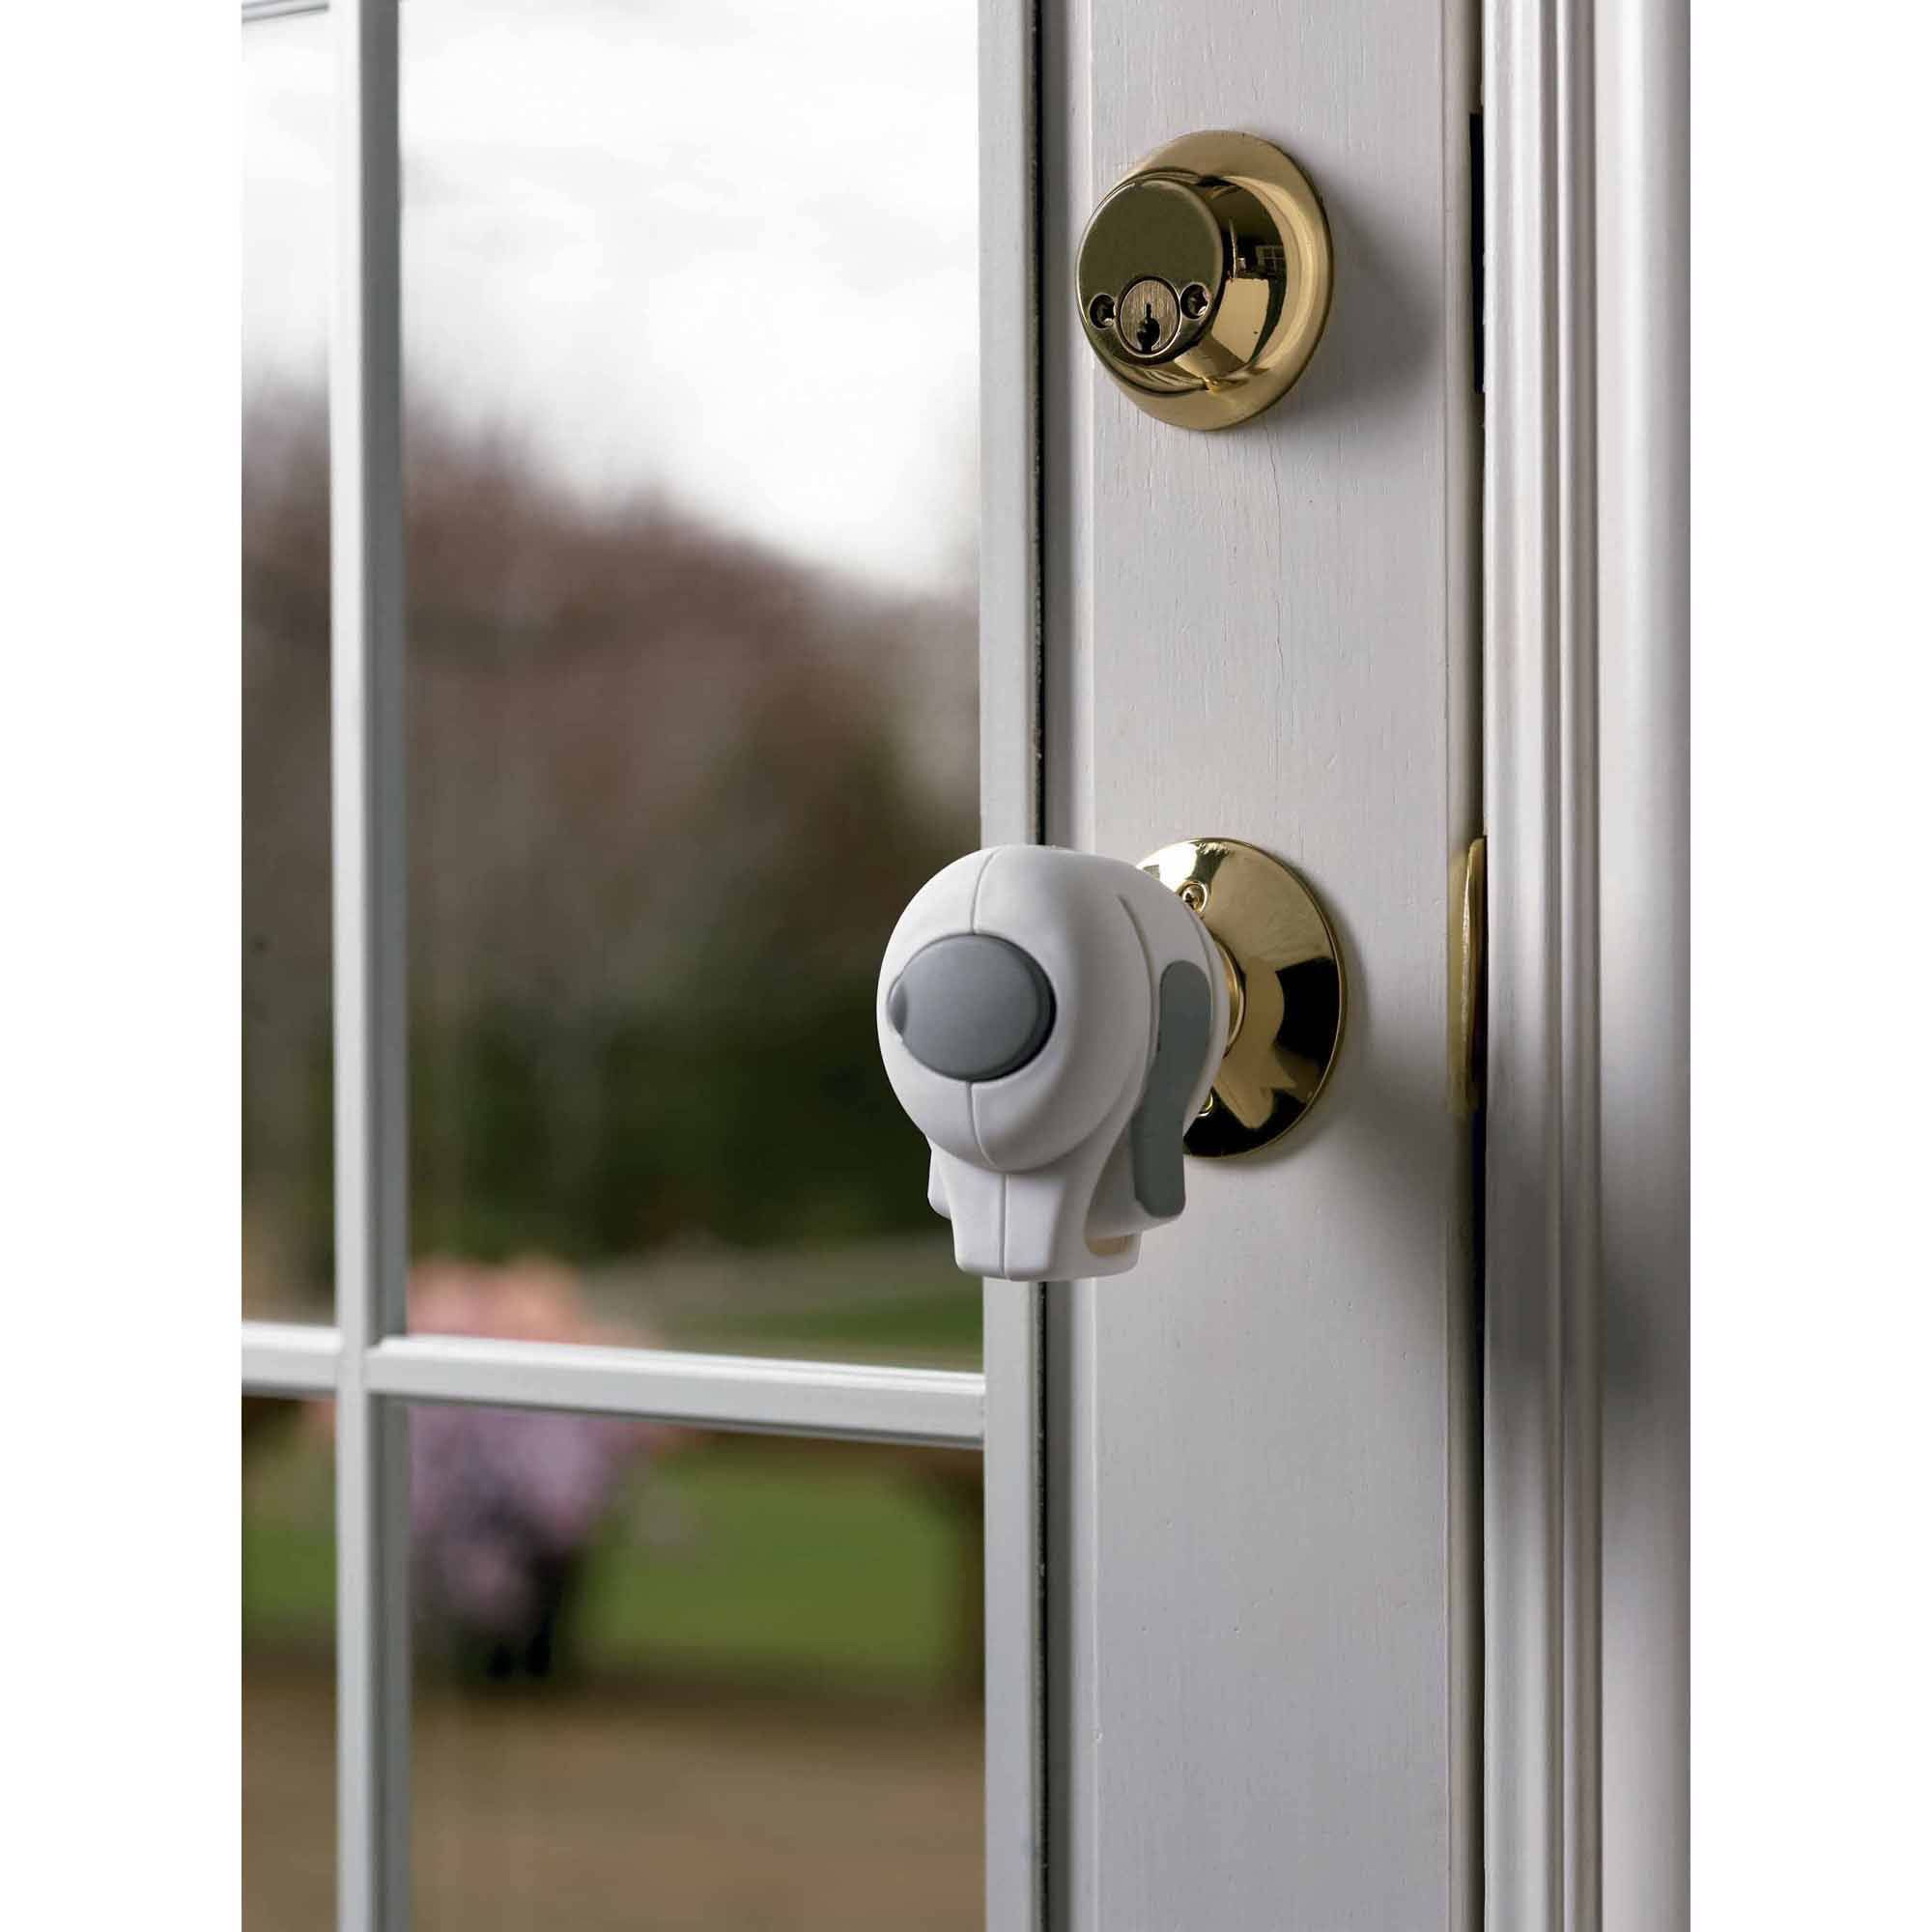 Best Door Knob Locks | http://retrocomputinggeek.com | Pinterest ...